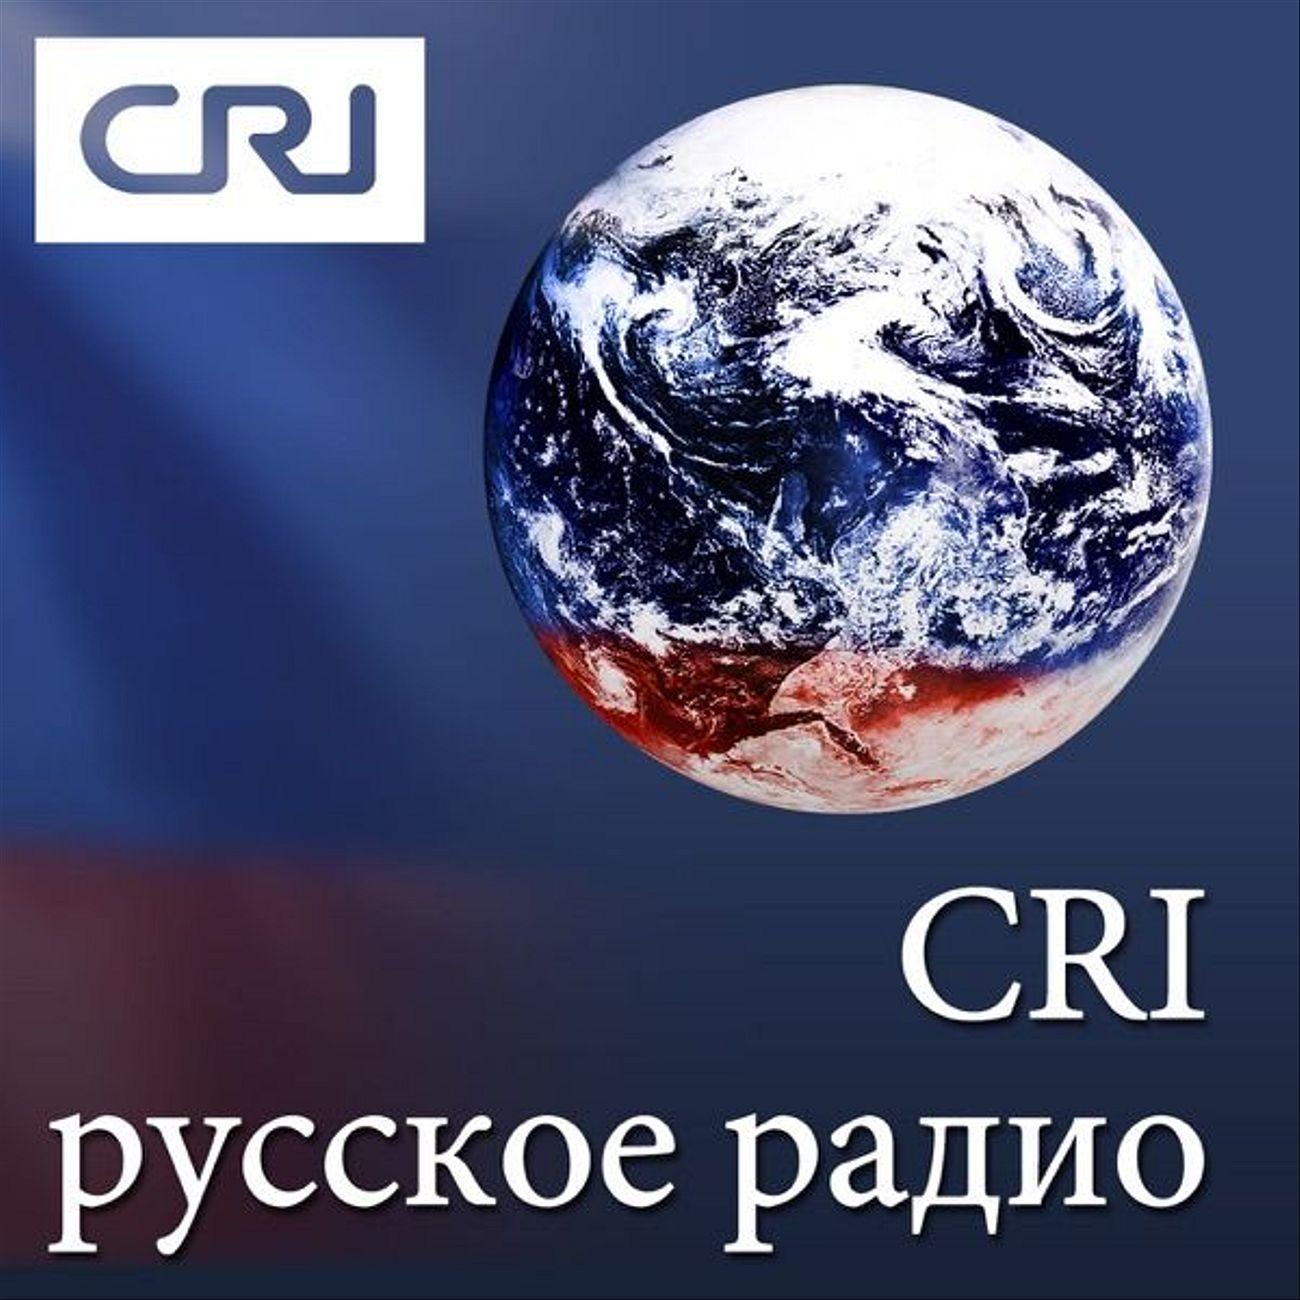 CRI русское радио